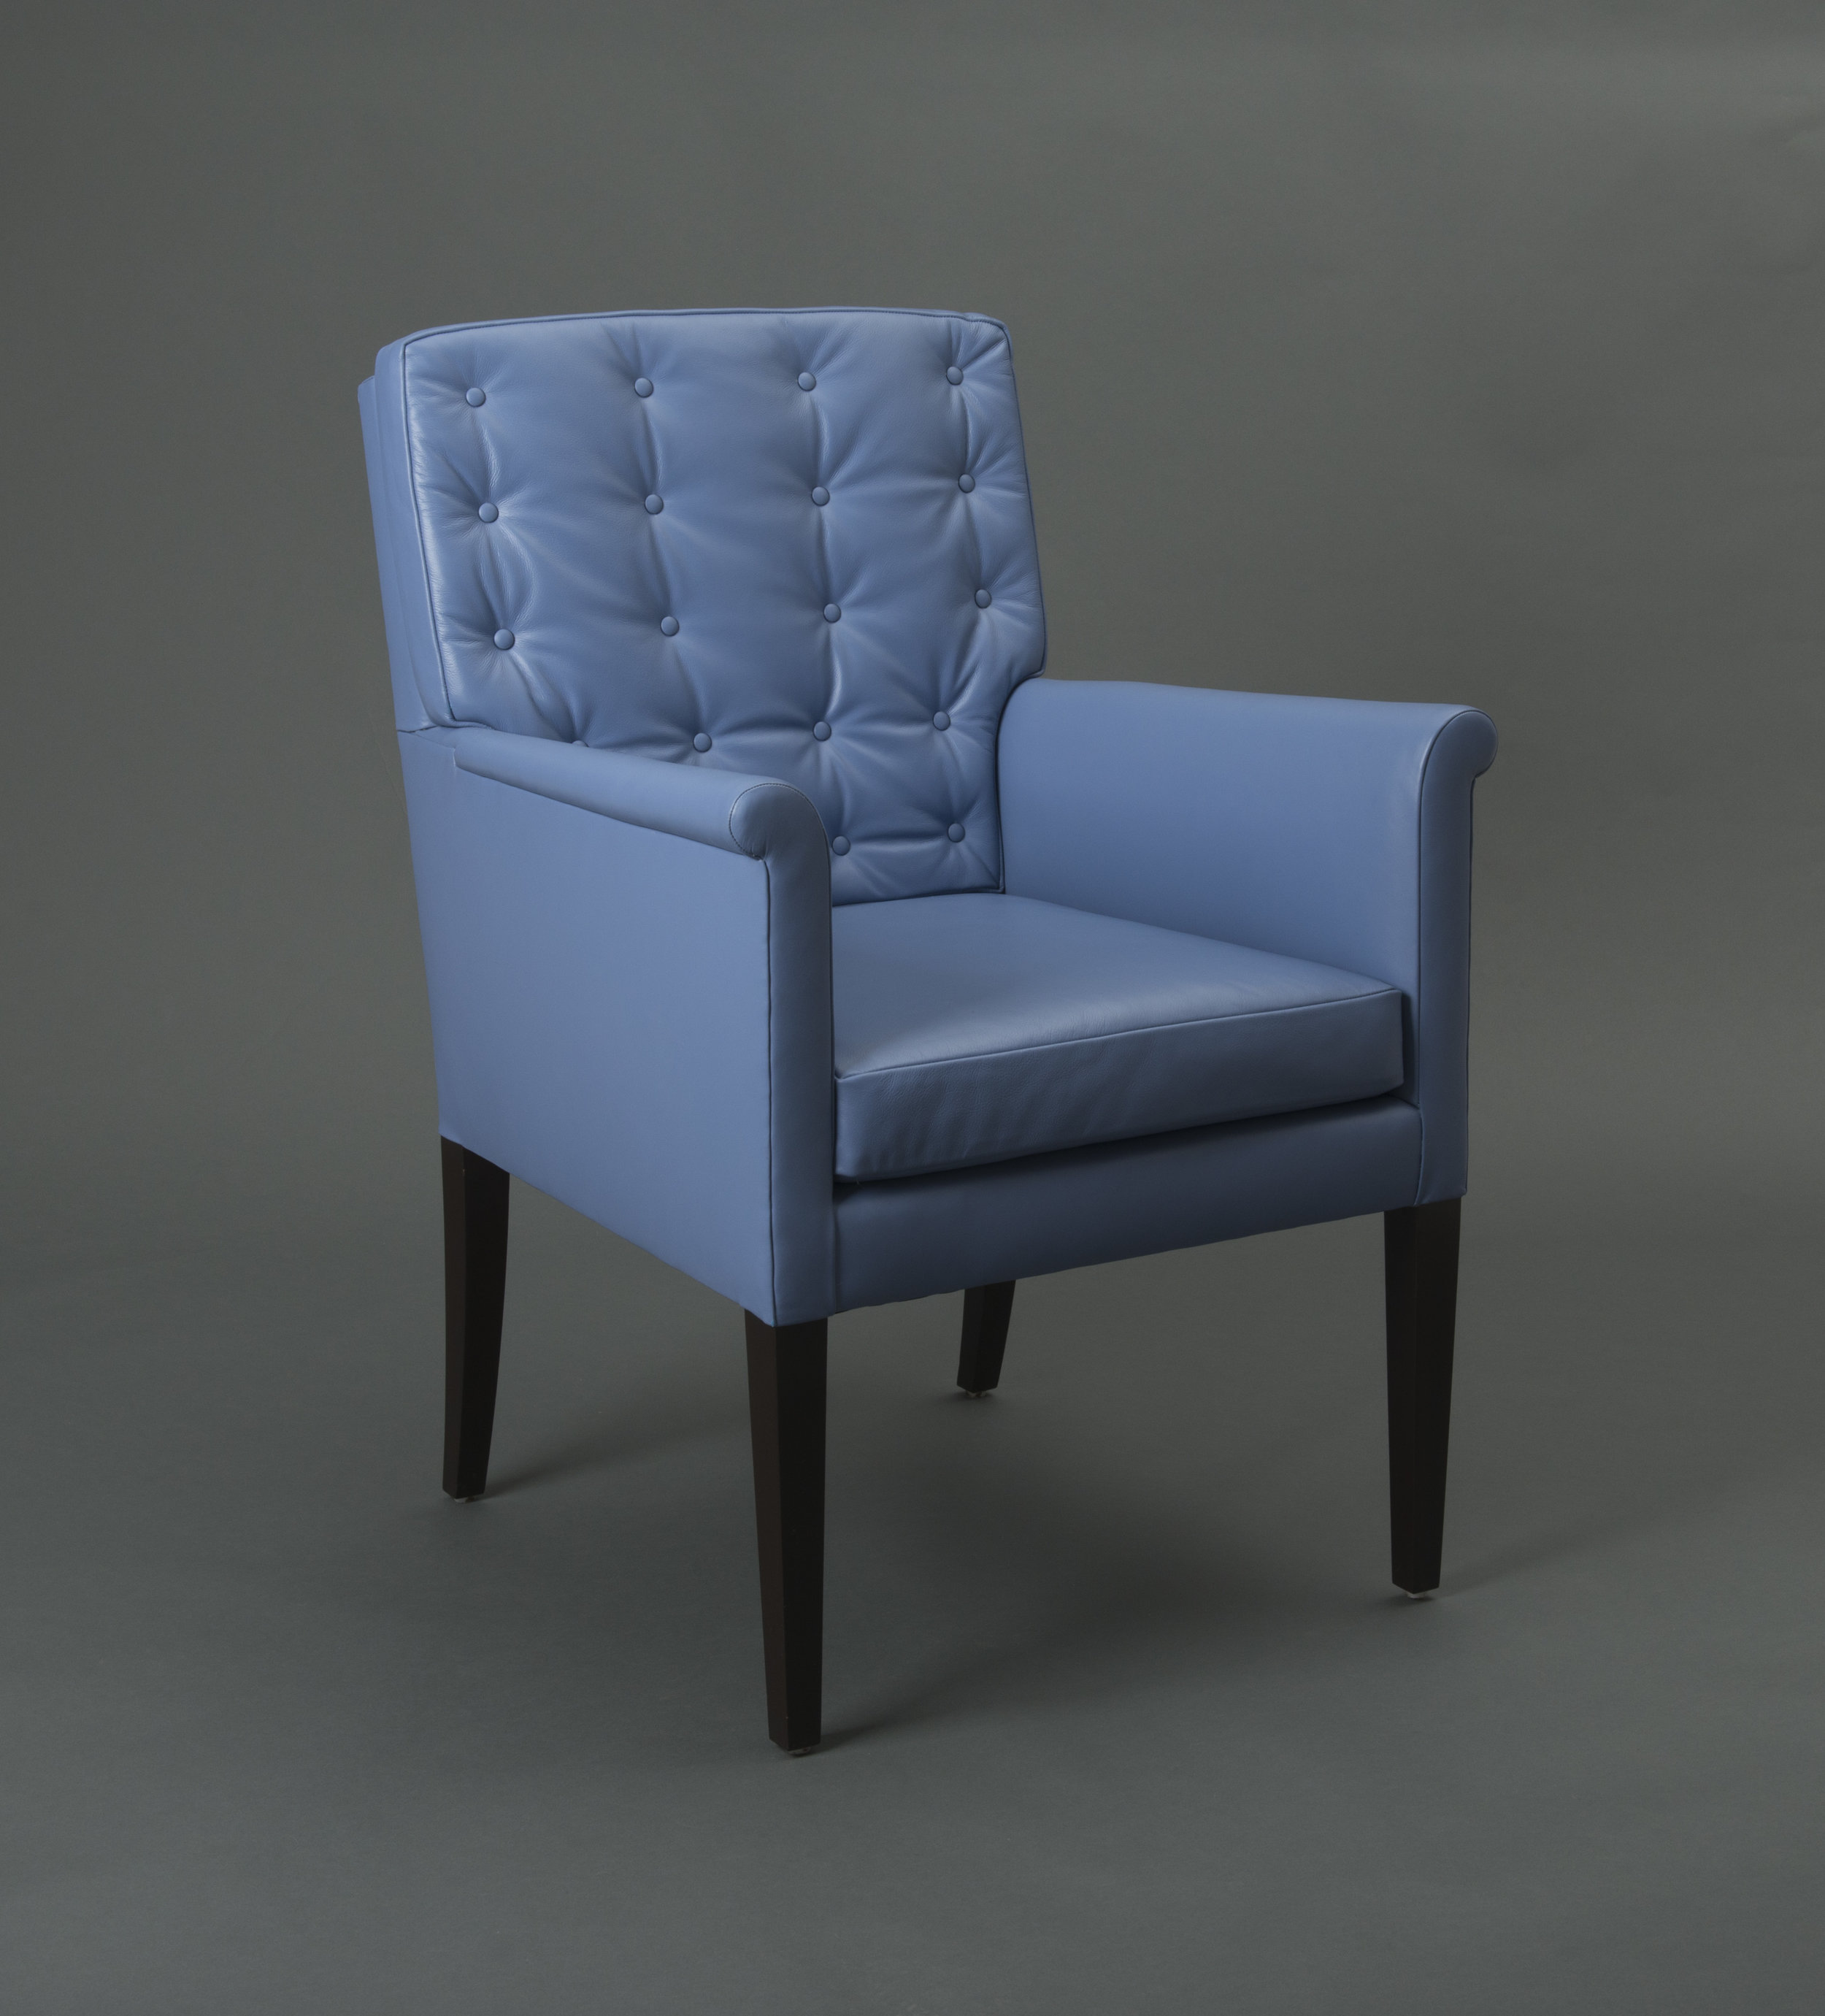 montgomery_chair1.jpg